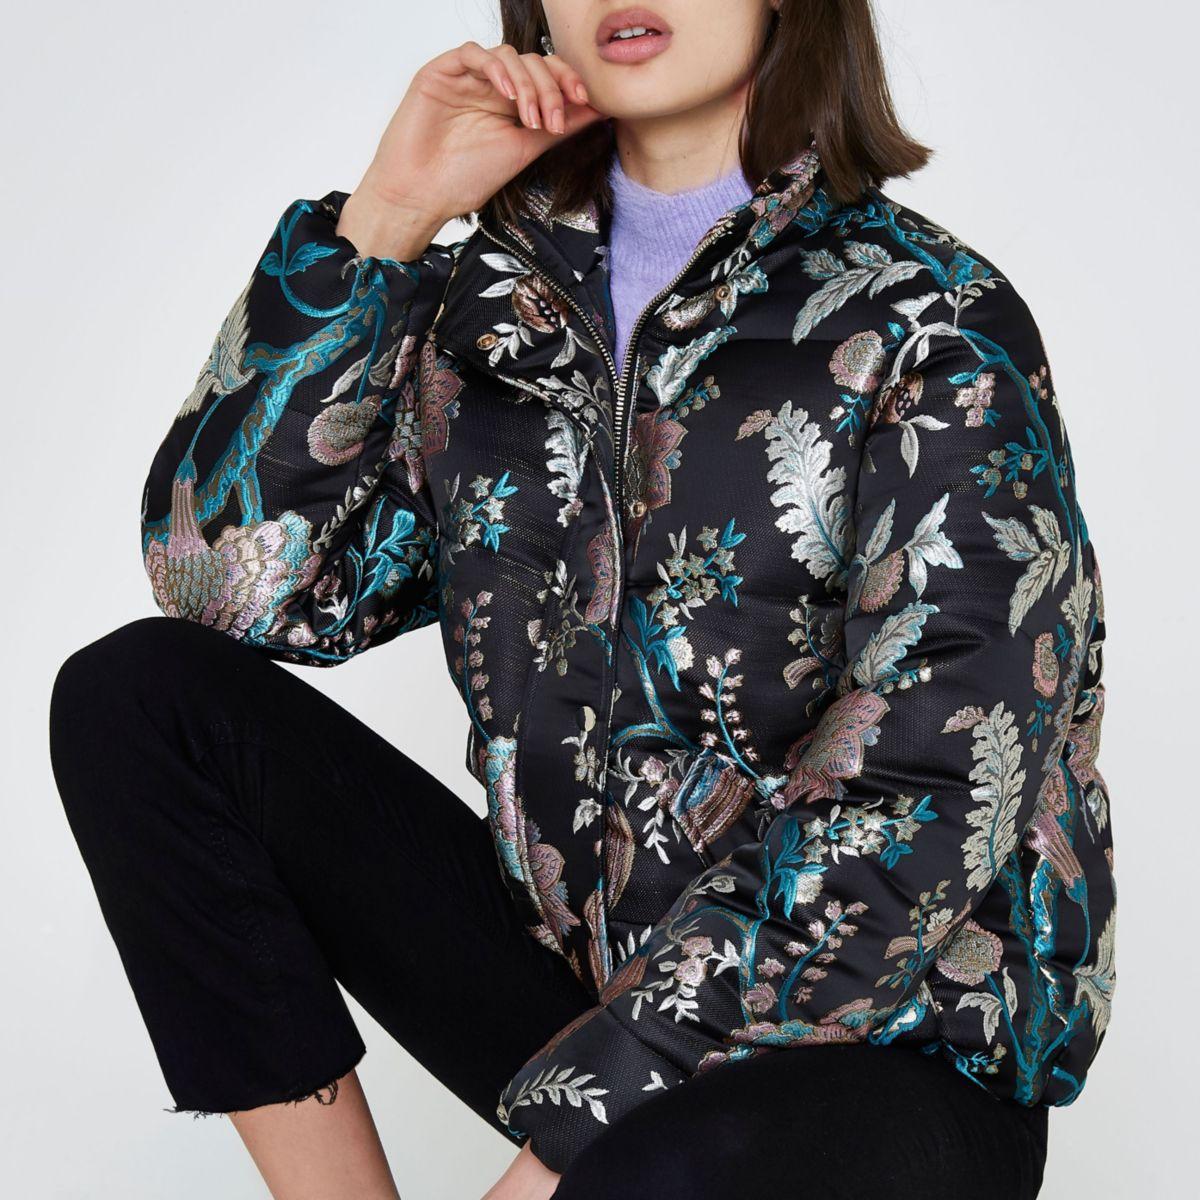 Black floral jacquard puffer jacket